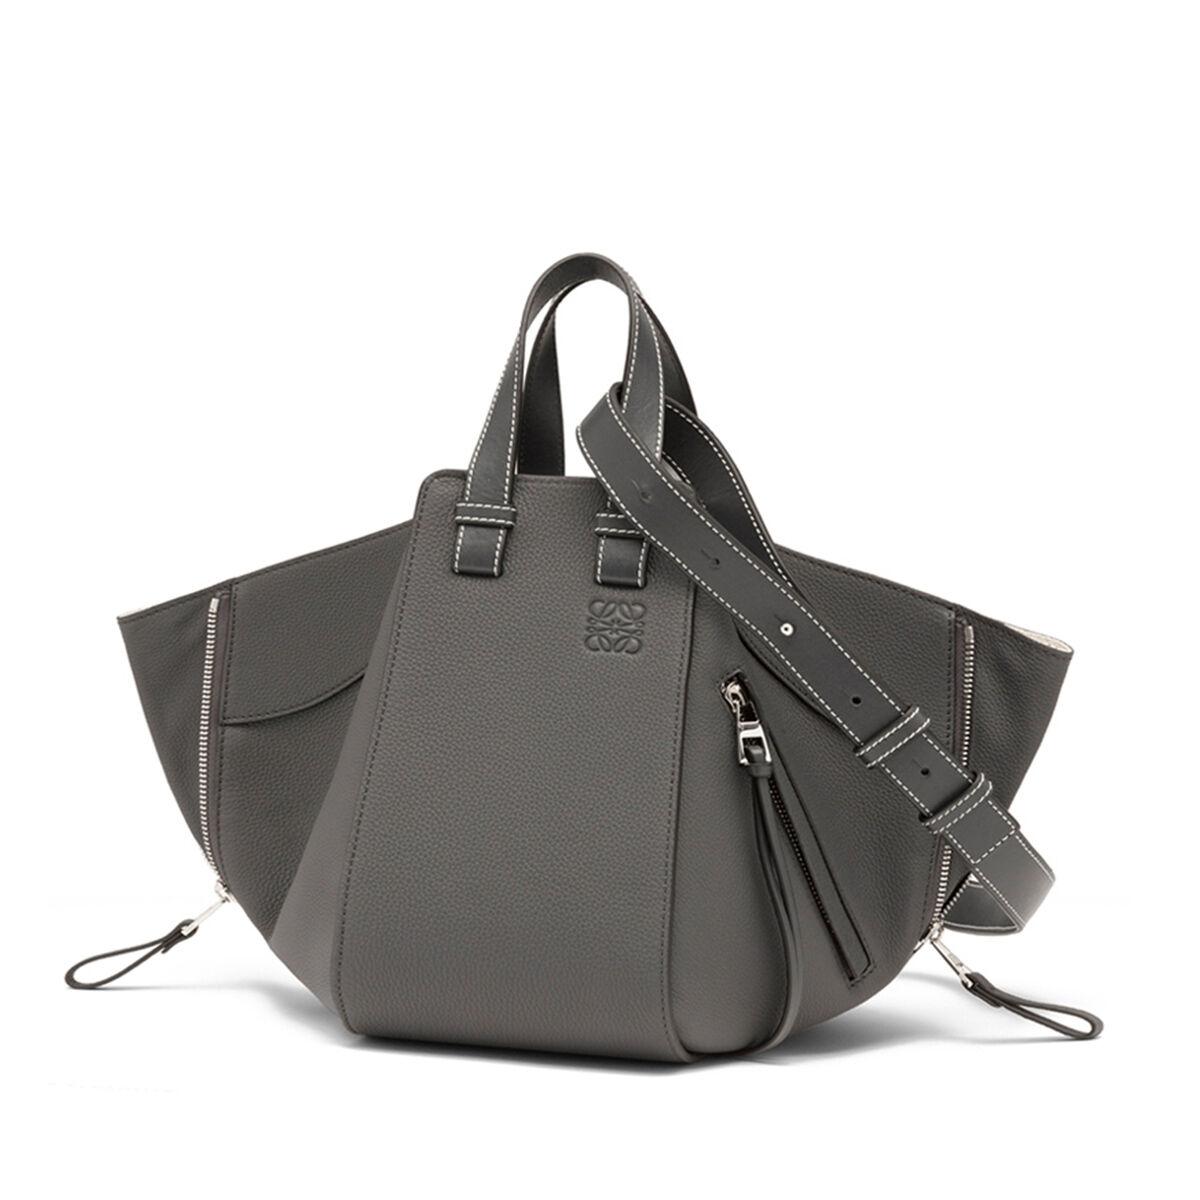 LOEWE Hammock Small Bag 煤灰色 all